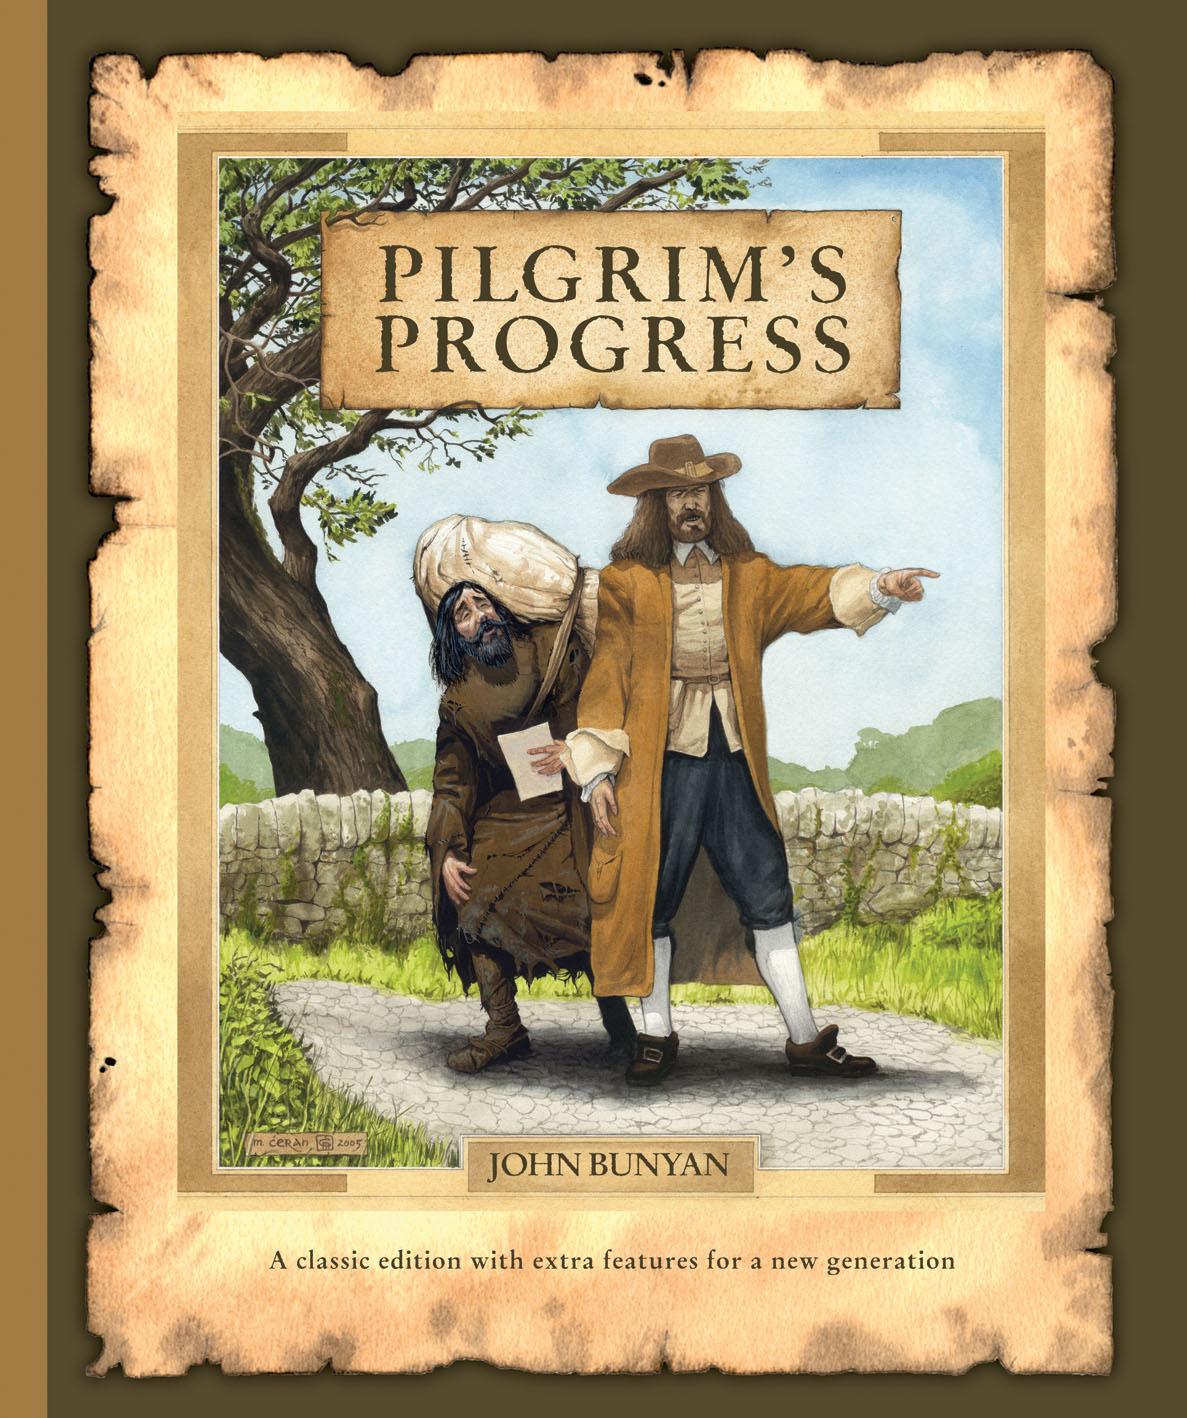 downloading books onto kindle